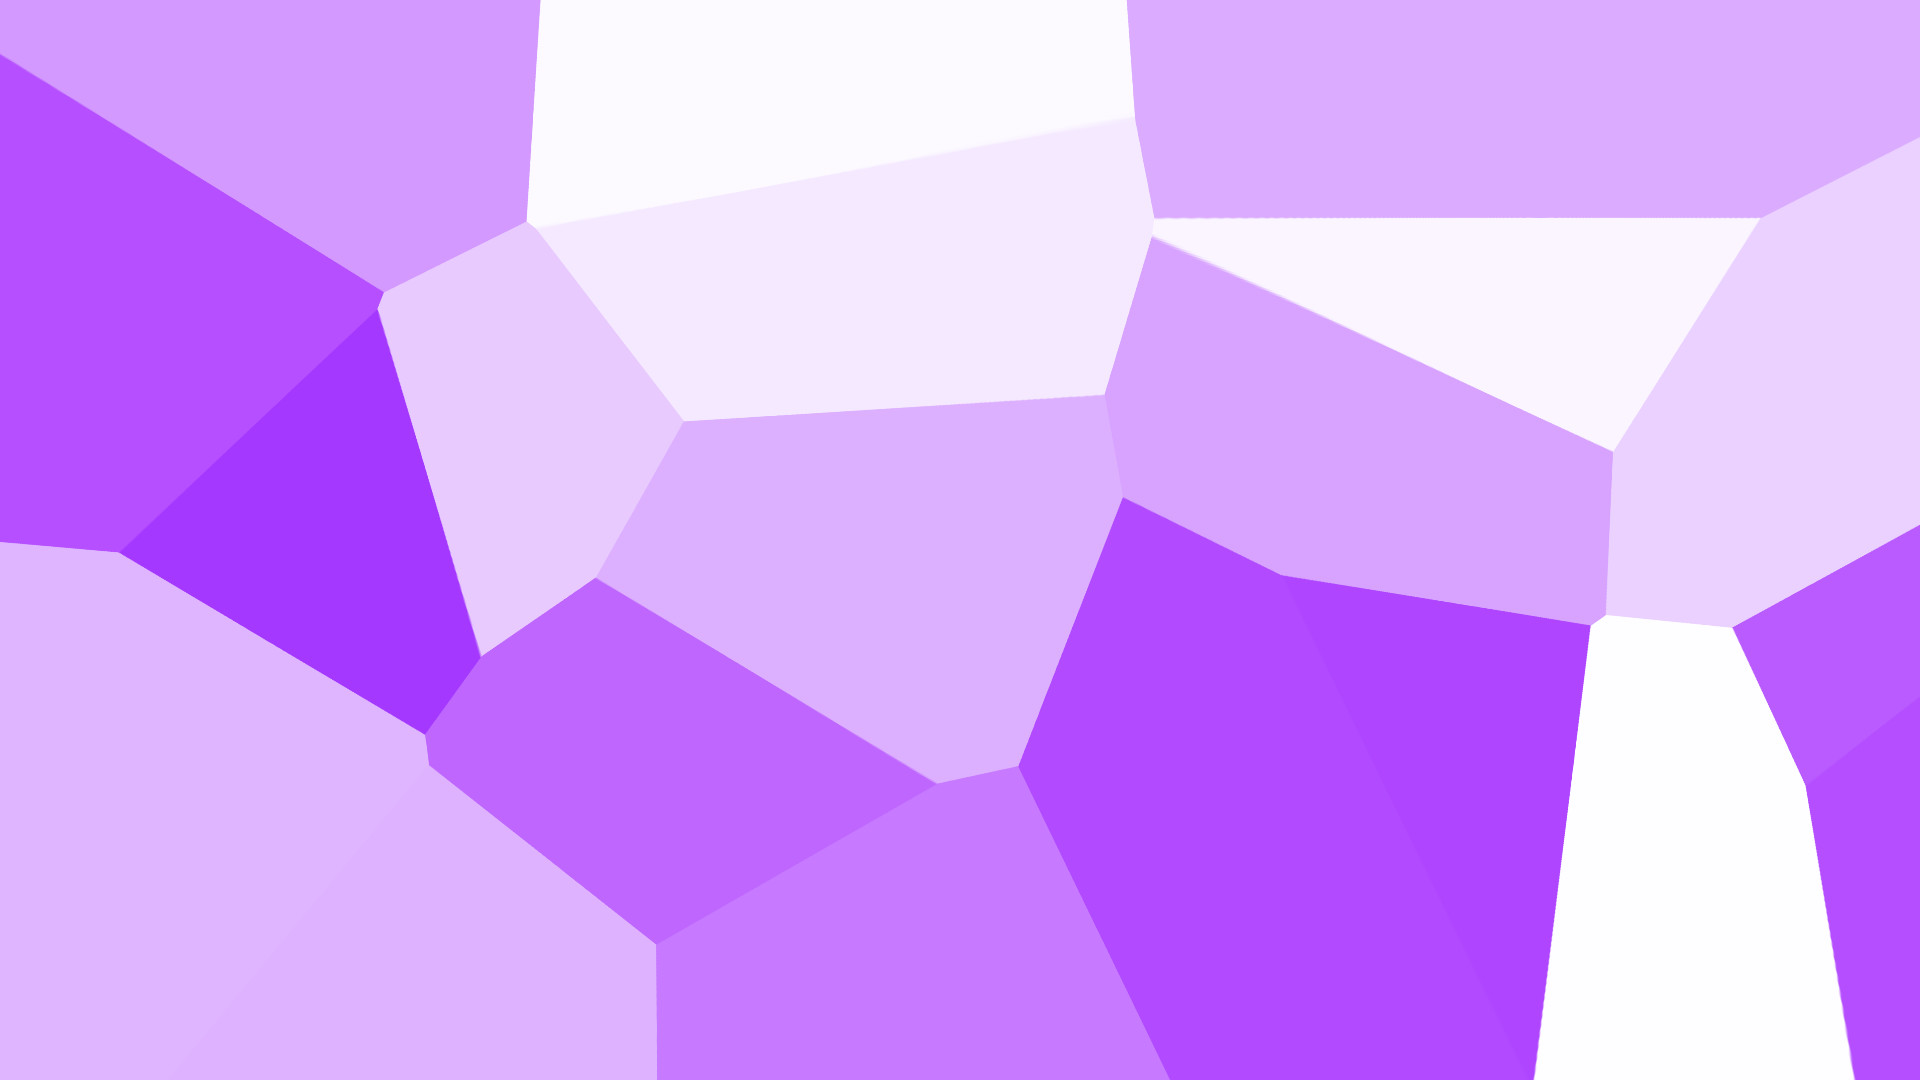 … Numa Flat Rags Wallpaper Purple Light by Charlie-Henson